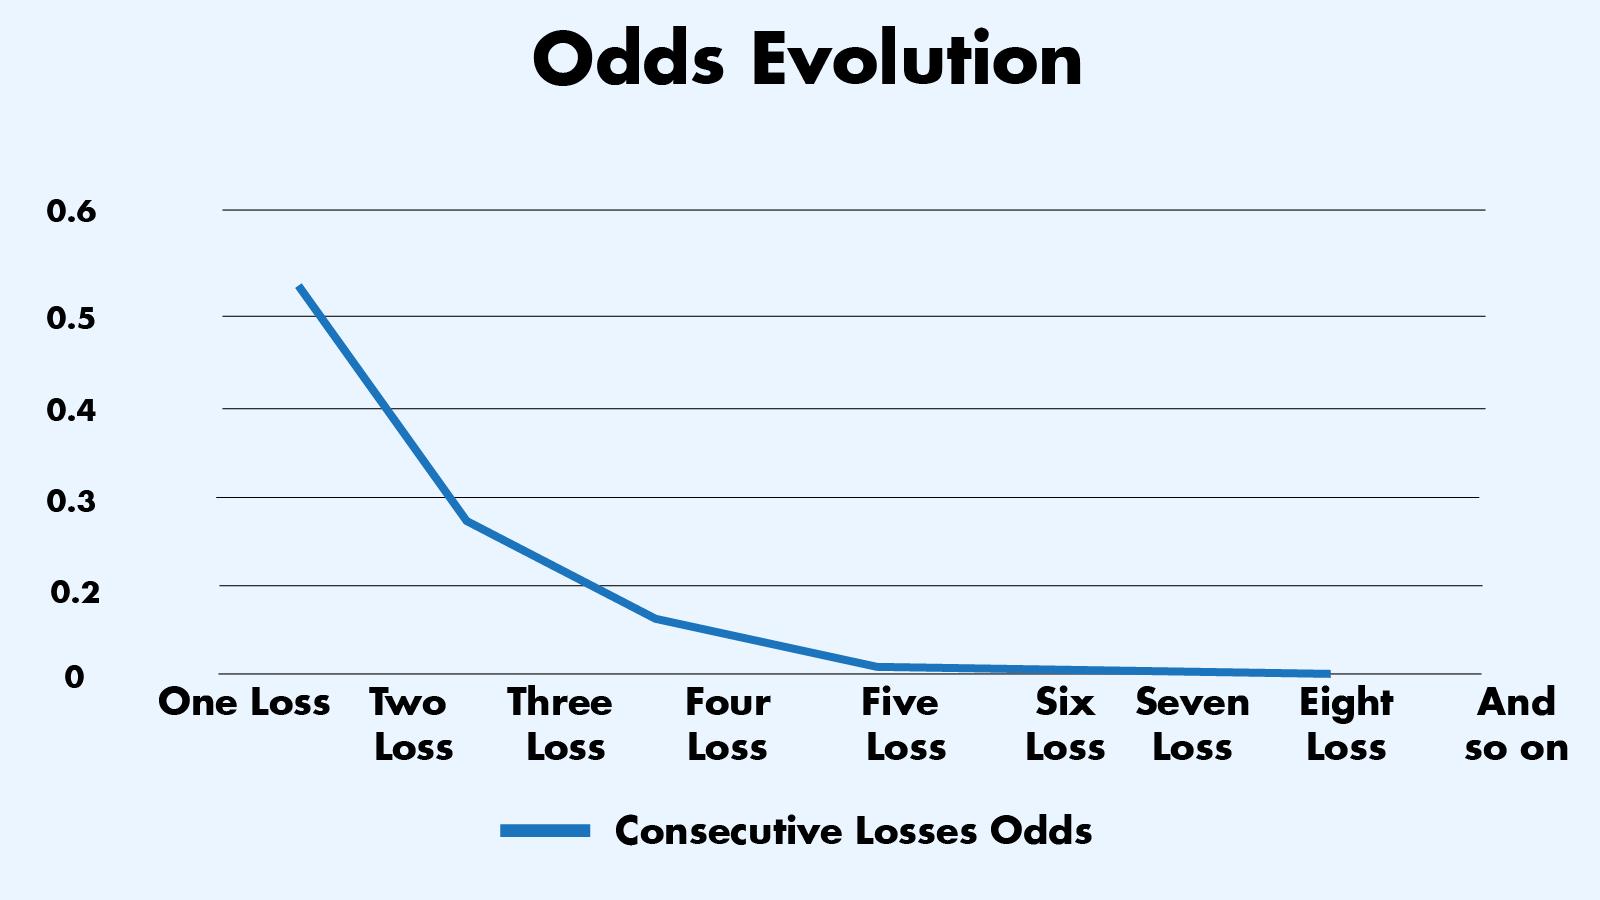 Odds of a Longer Losing Streak Decrease Fast